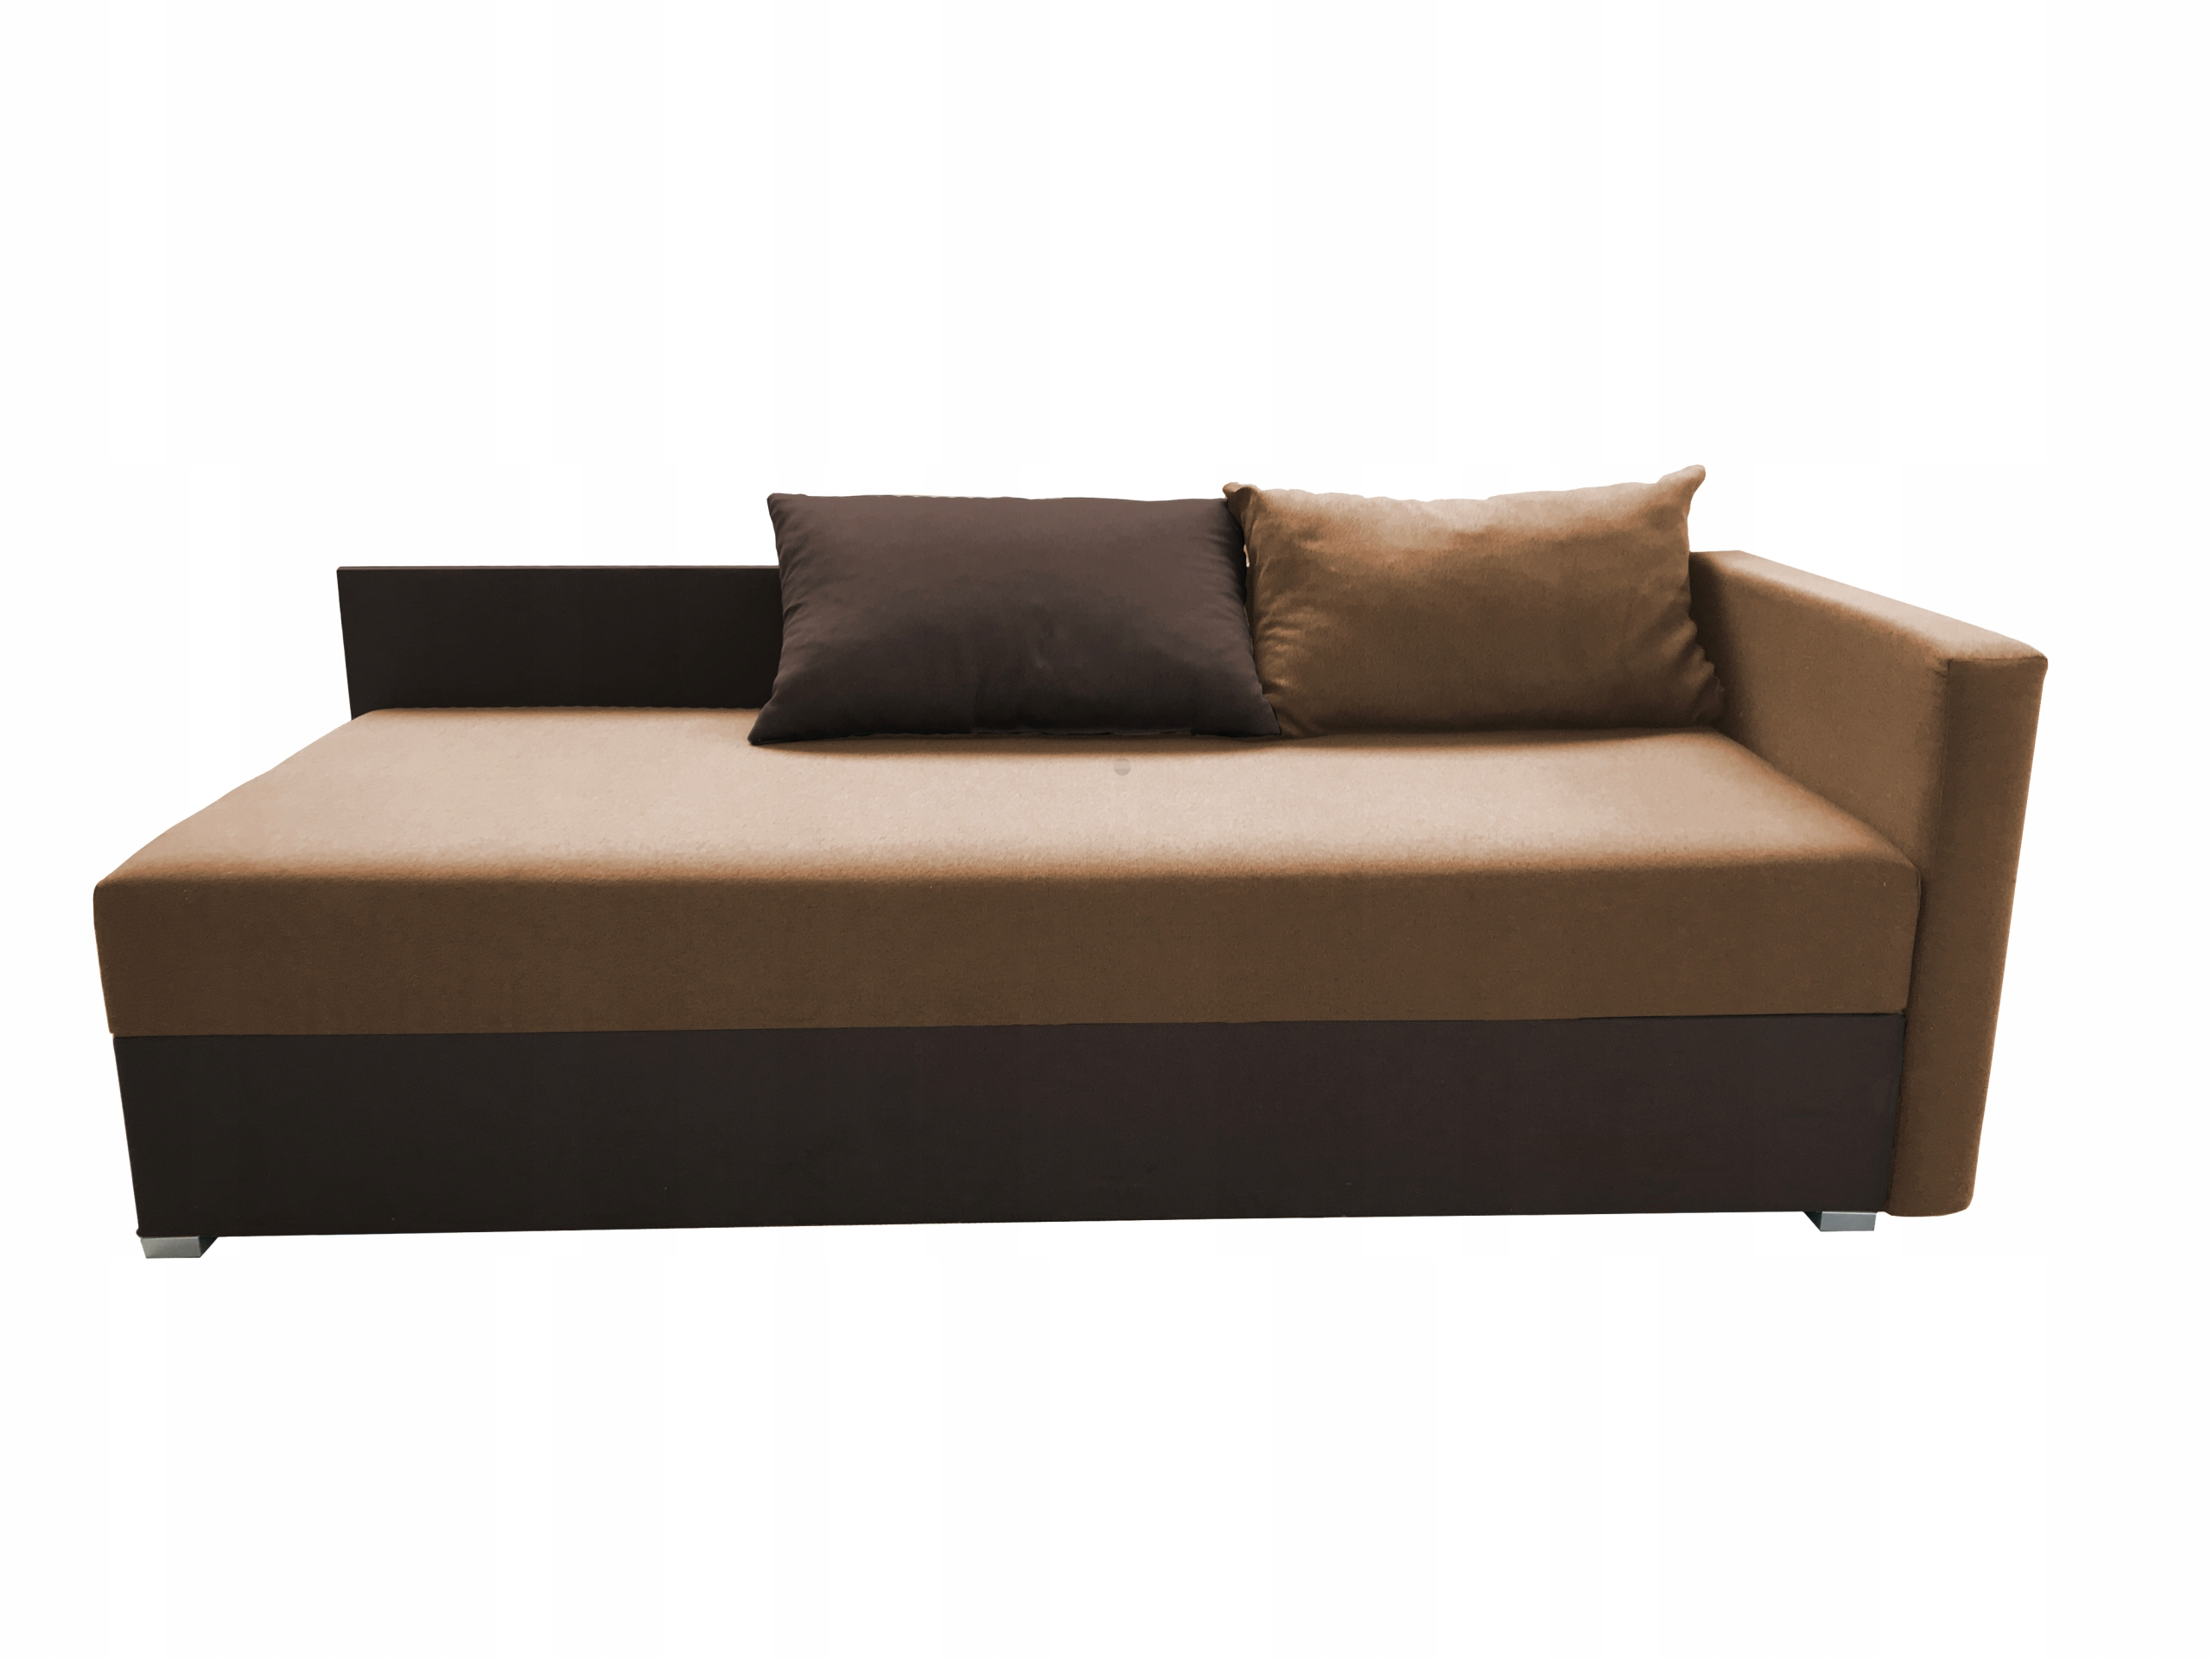 Wersalka Kanapa Sofa Funkcja Spania Agata 7462194558